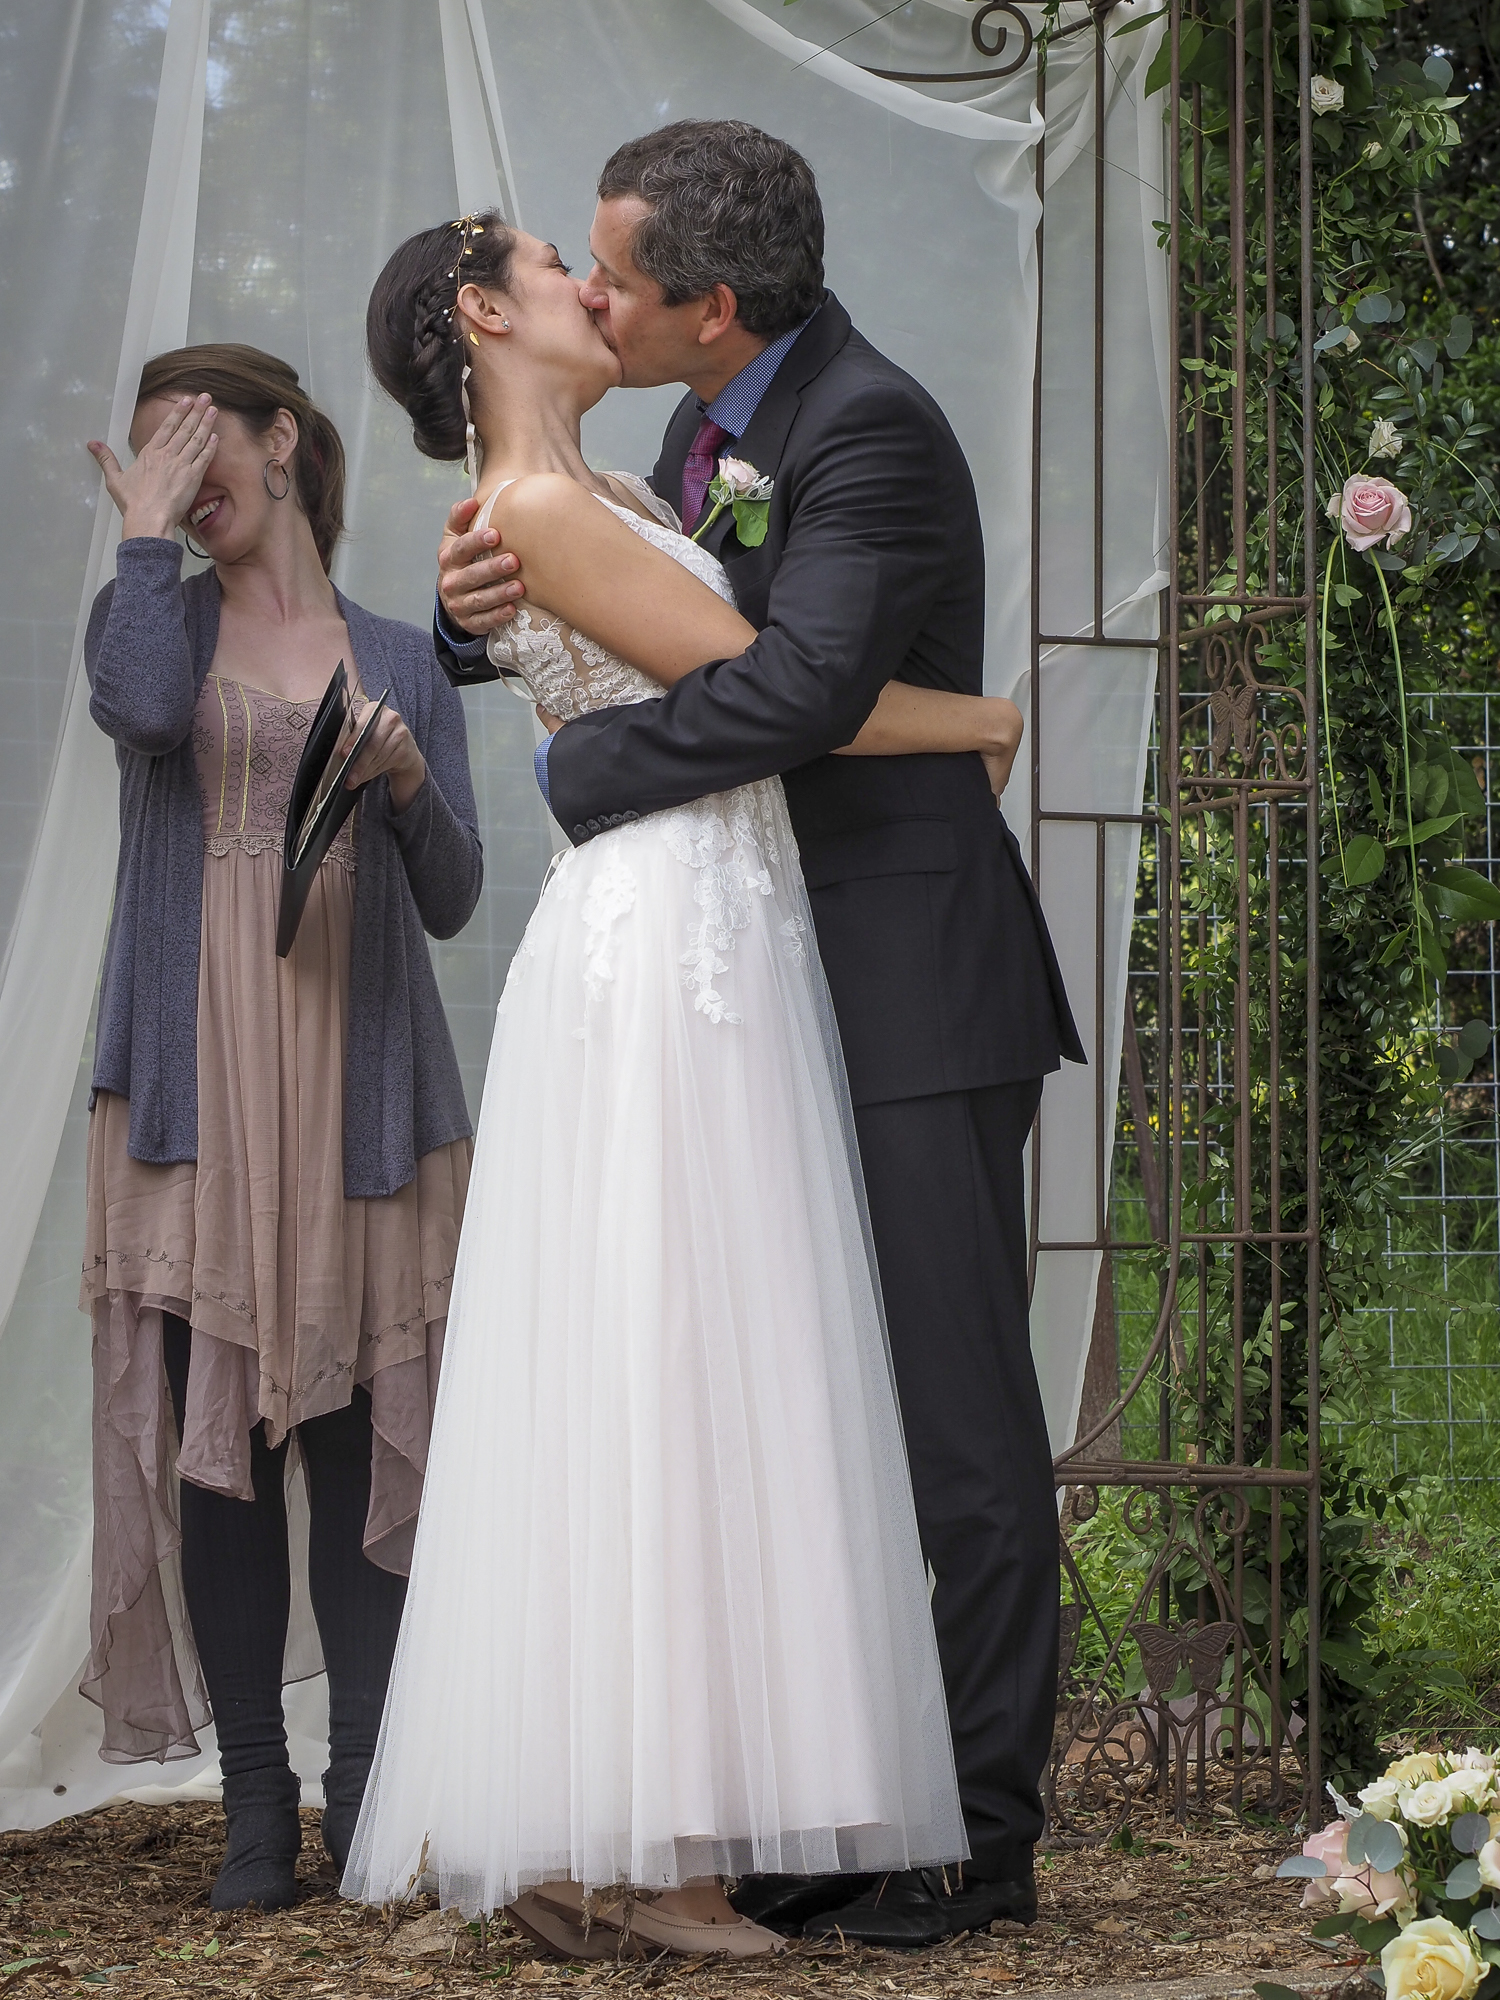 pg_wedding-17.jpg